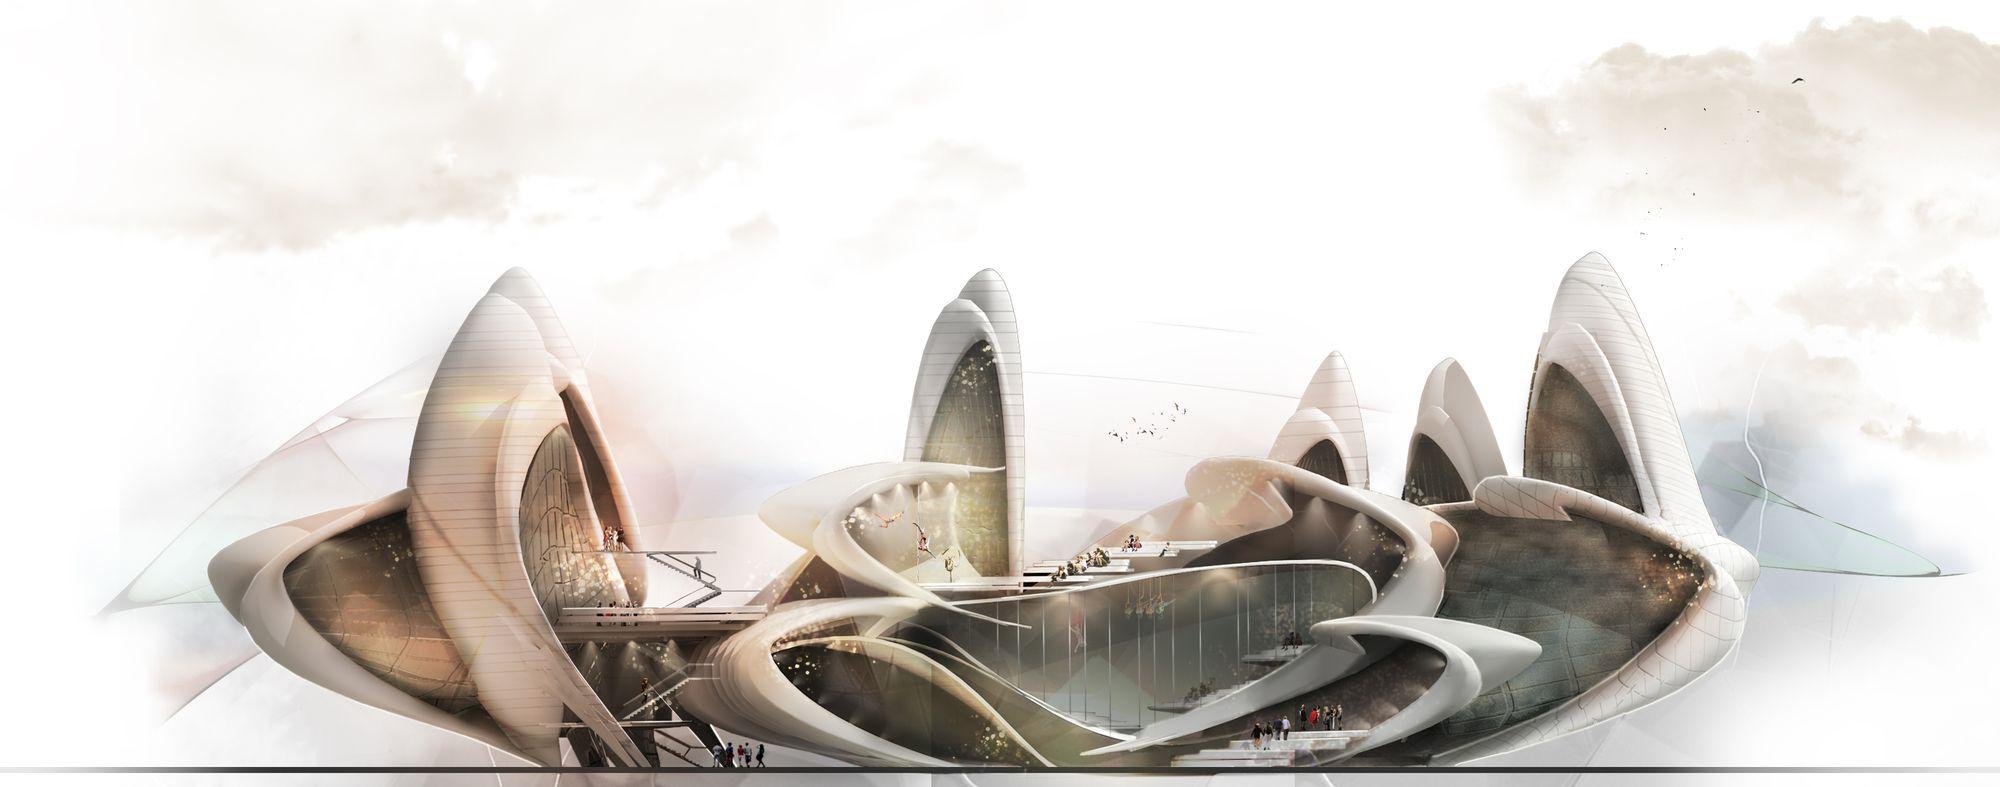 A equipe de arquitetos Maryam Fazel e Belinda Ercan, do Irã e da Alemanha, respectivamente, venceu o concurso para o projeto da Escola de Circo de...